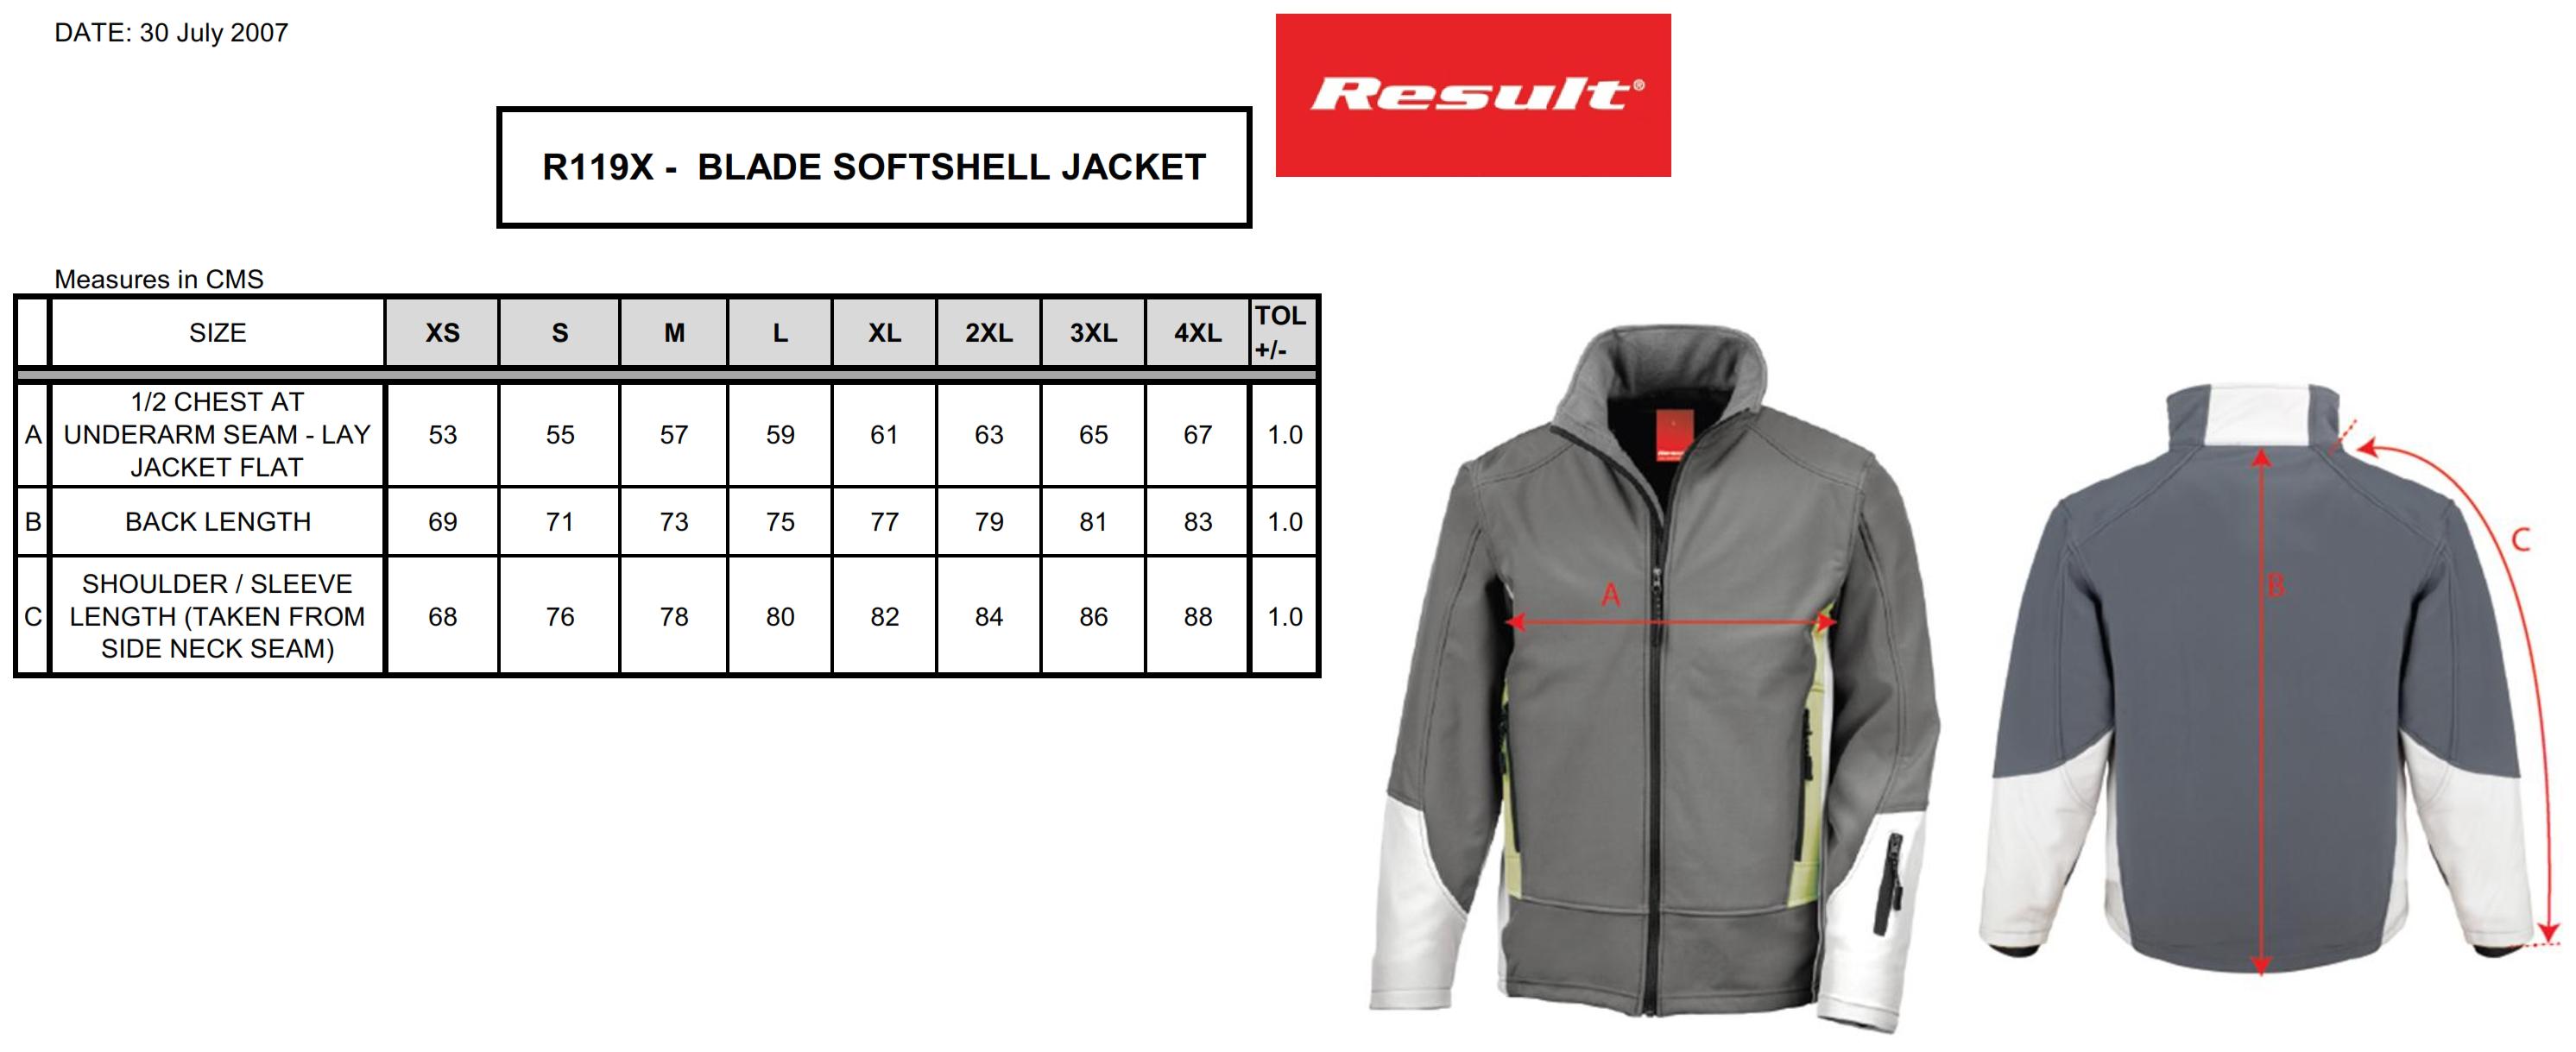 Result: Blade Soft Shell Jacket R119X